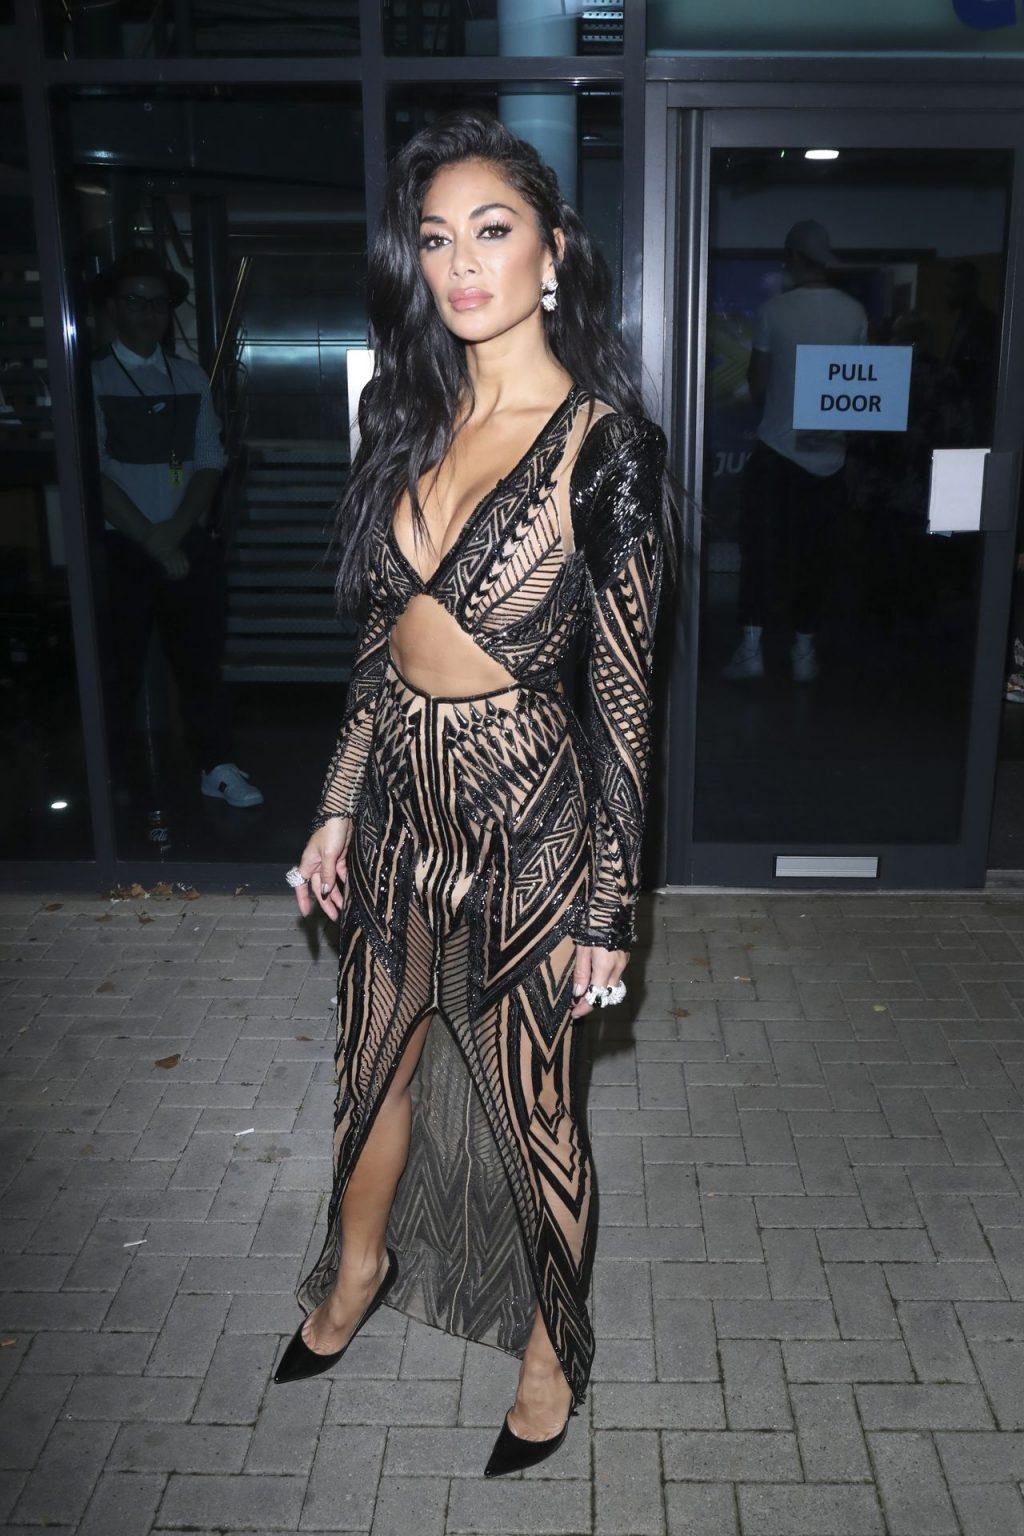 Nicole Scherzinger Sexy (65 New Photos)